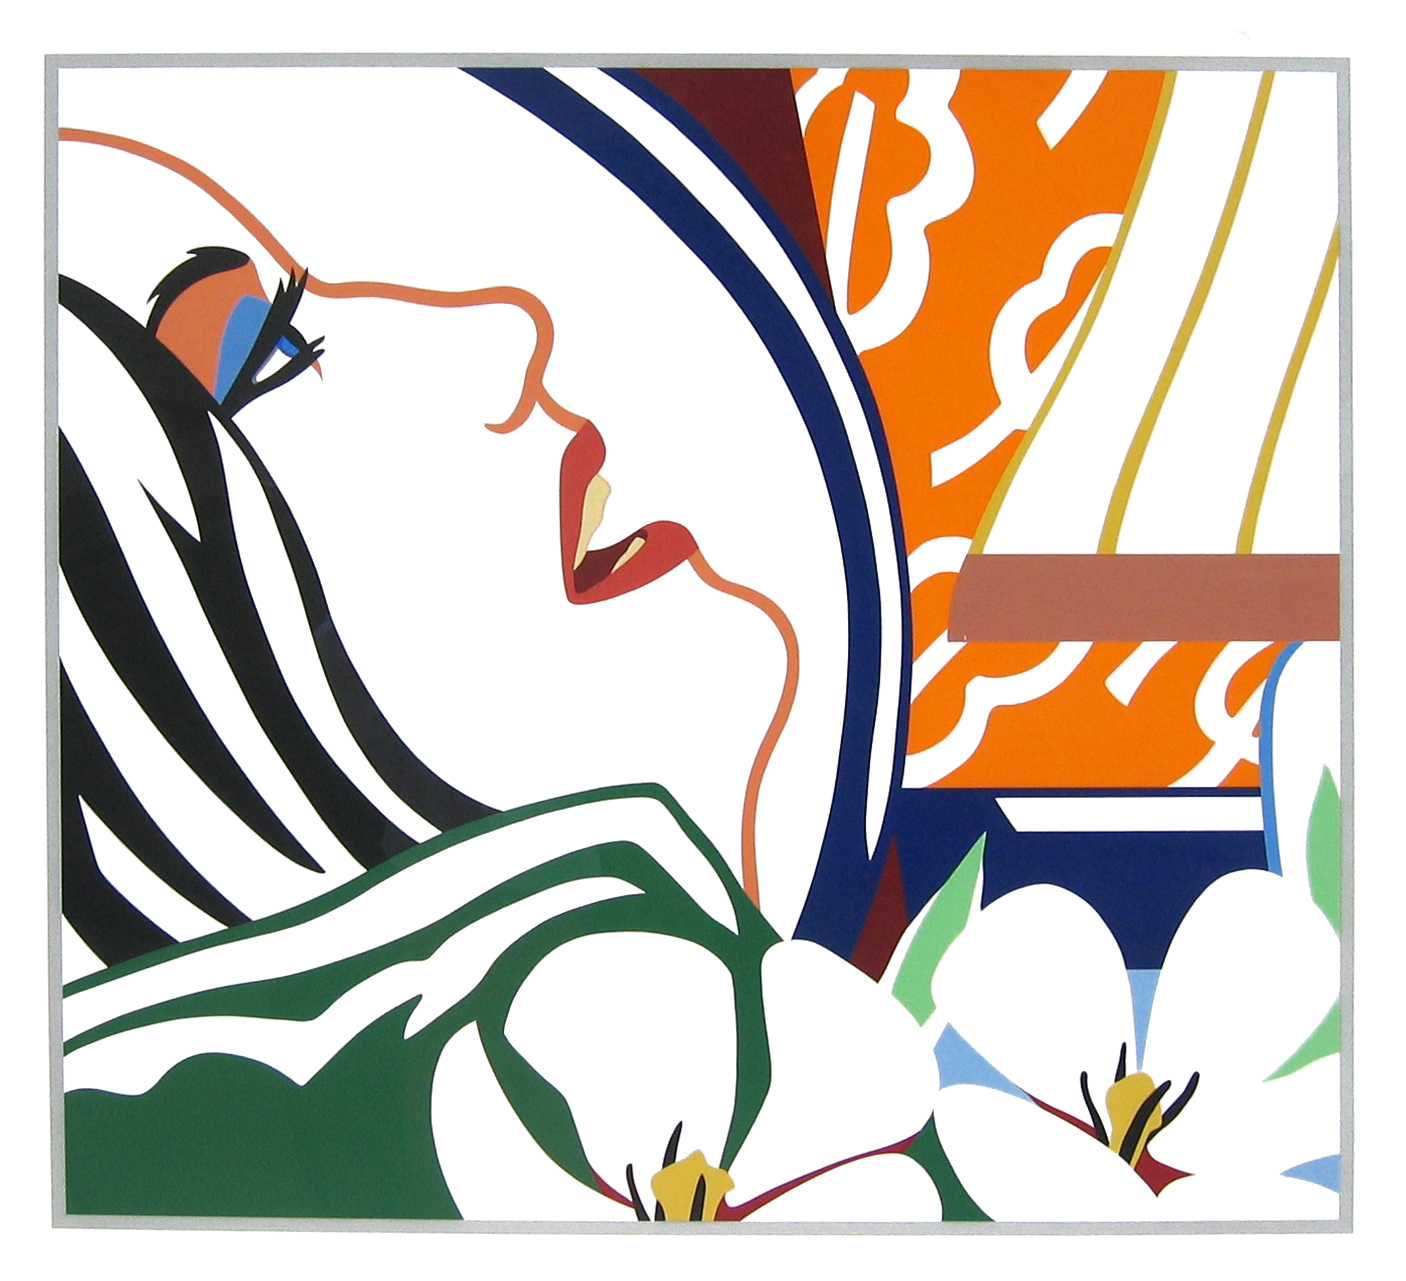 Tom Wesselmann Bedroom Face with Orange Wallpaper 1987 Silkscreen 1406x1281